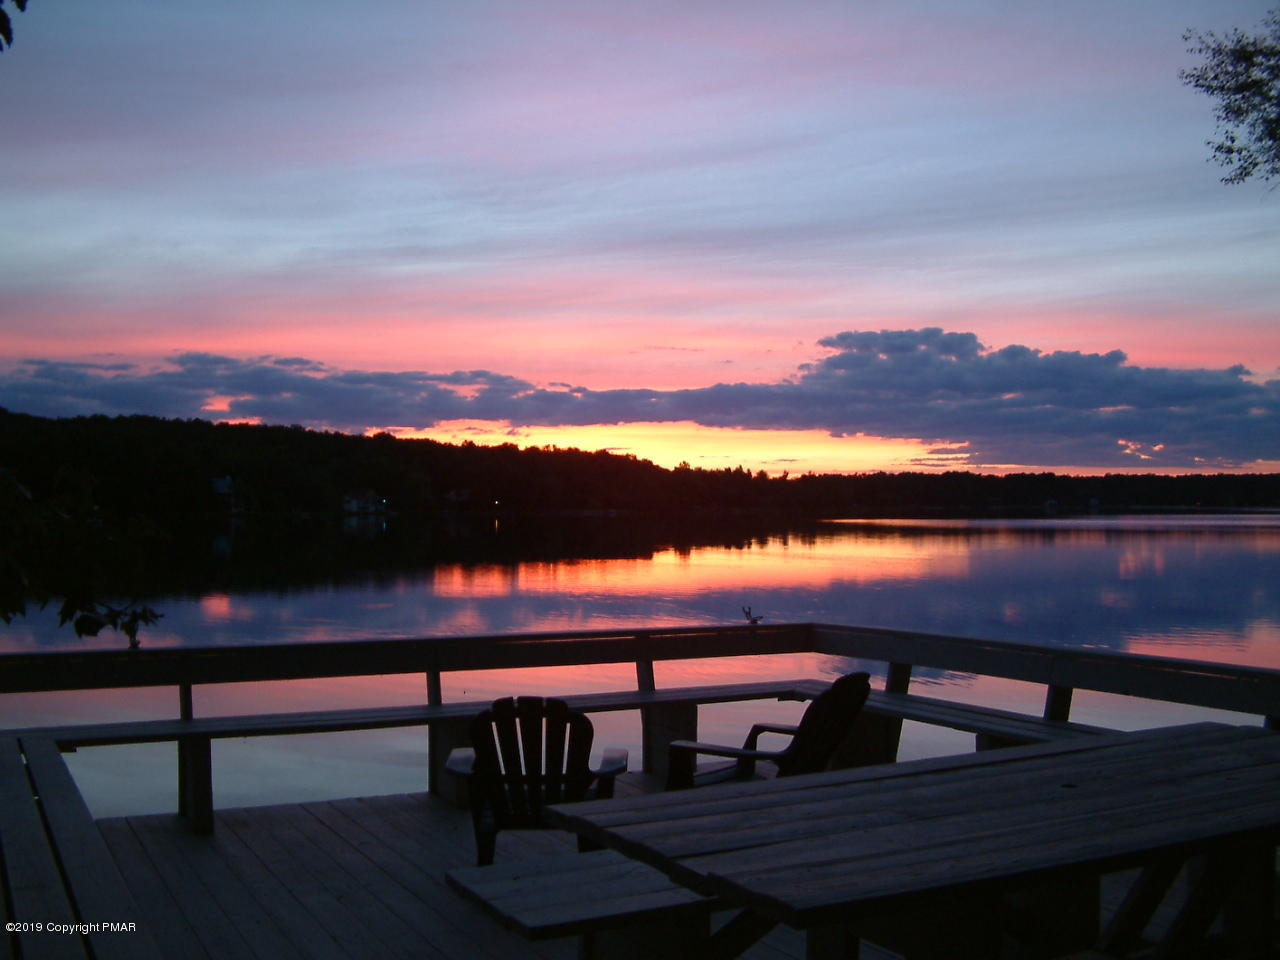 8-59-11 Namanock Trl, Pocono Lake, PA 18347